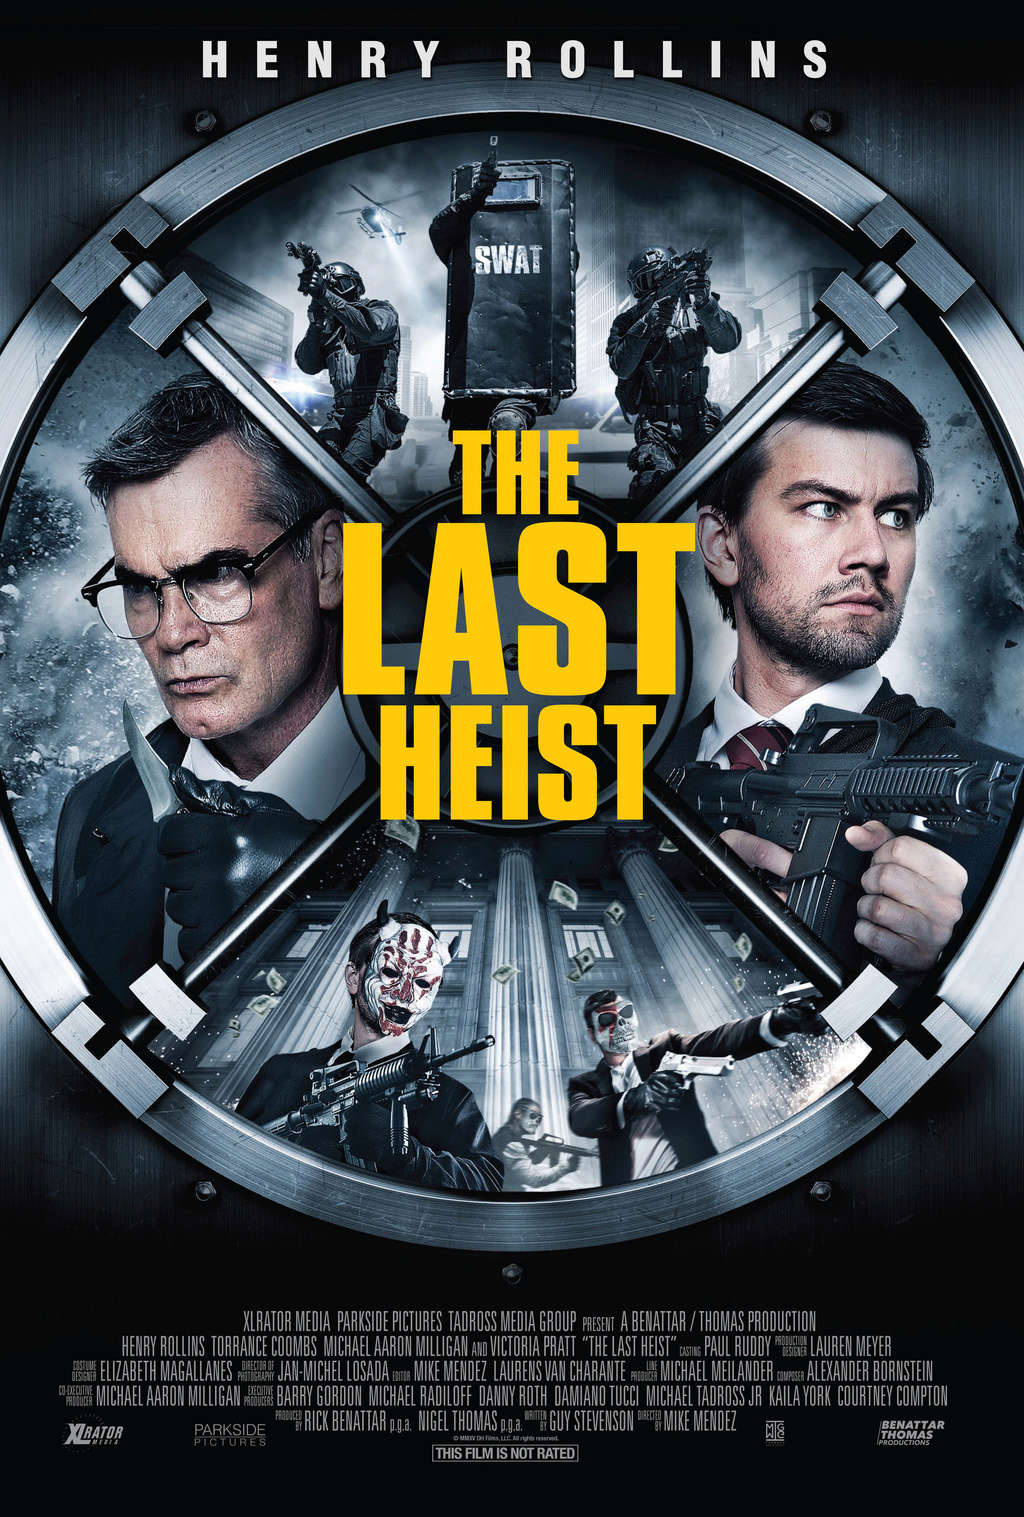 مشاهدة وتحميل فيلم The Last Heist 2016 720p مترجم اون لاين